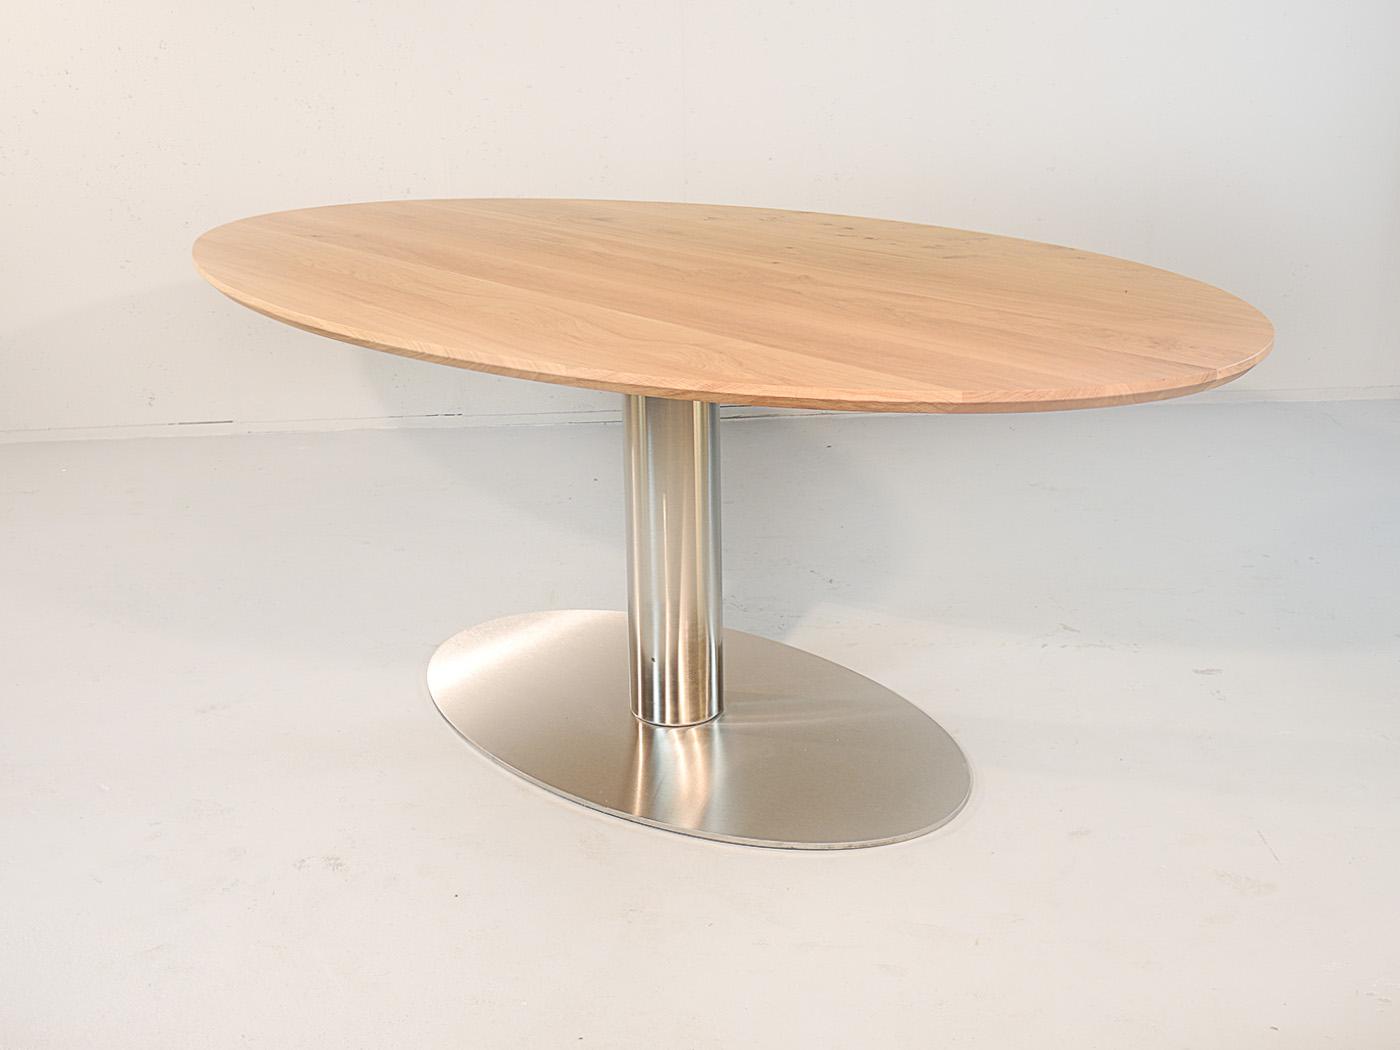 Bologna - Ovale eettafel design